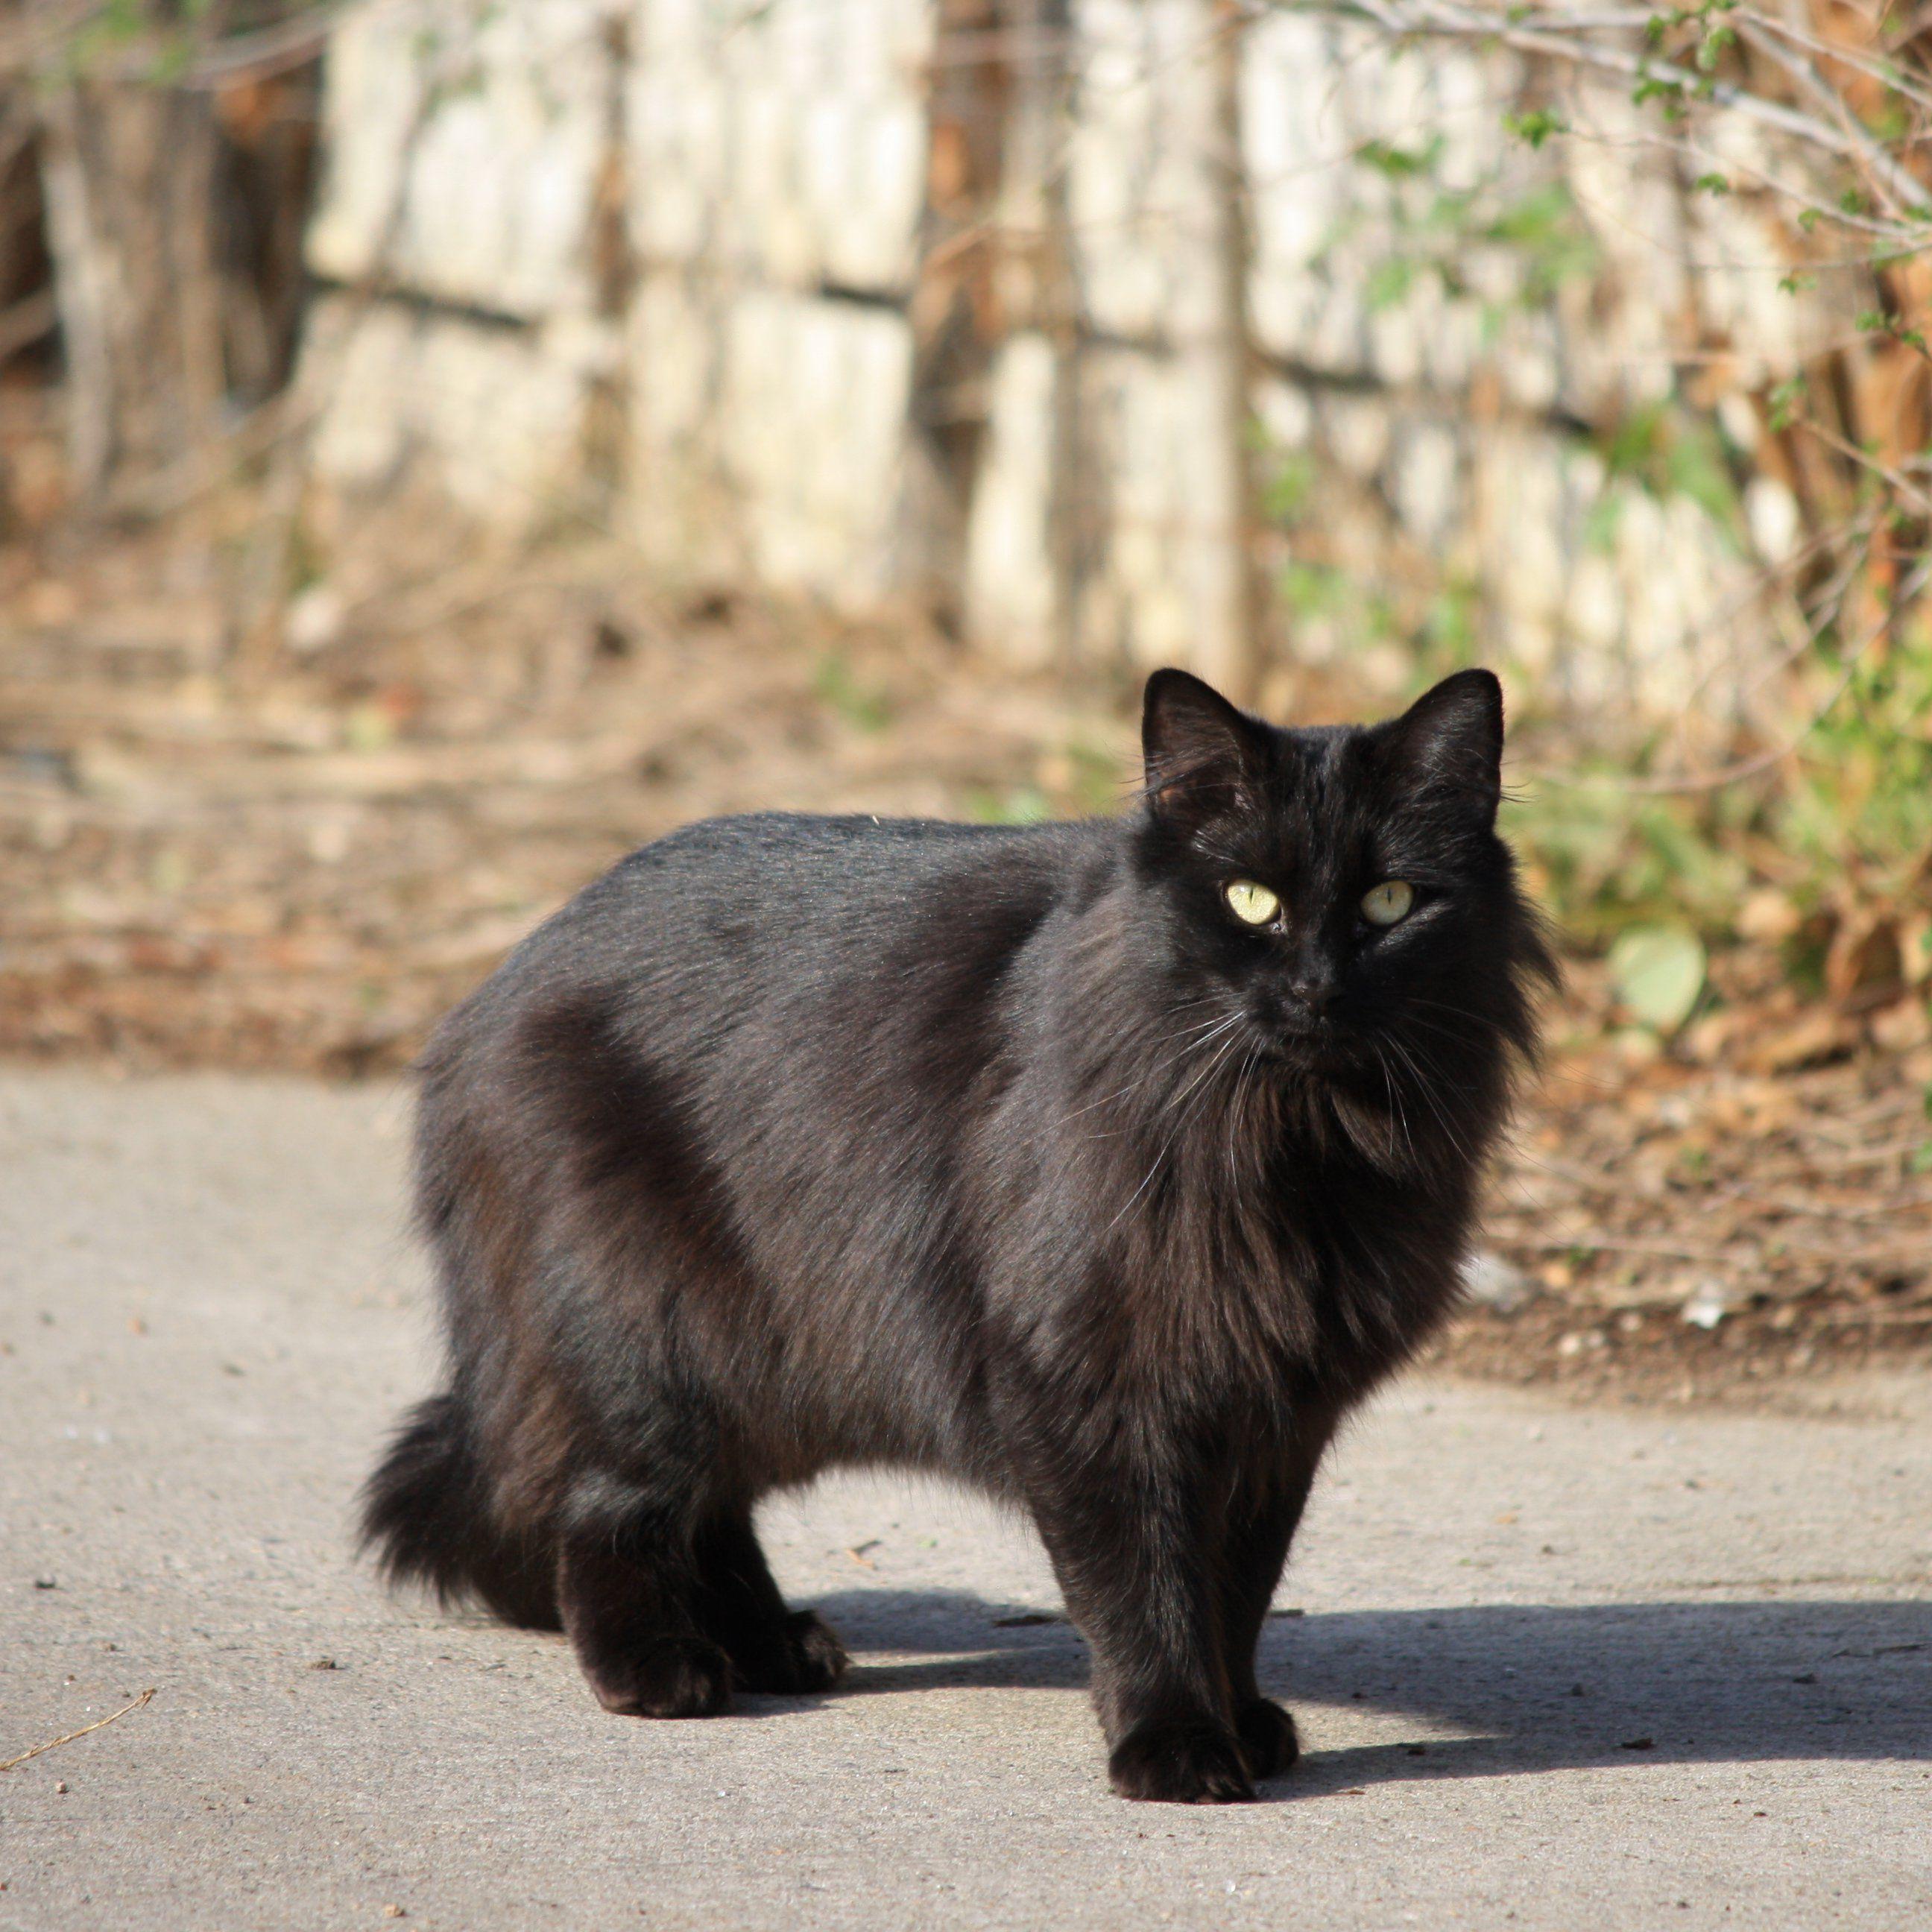 Black Longhaired Cat. So pretty. Looks like Jack. I may